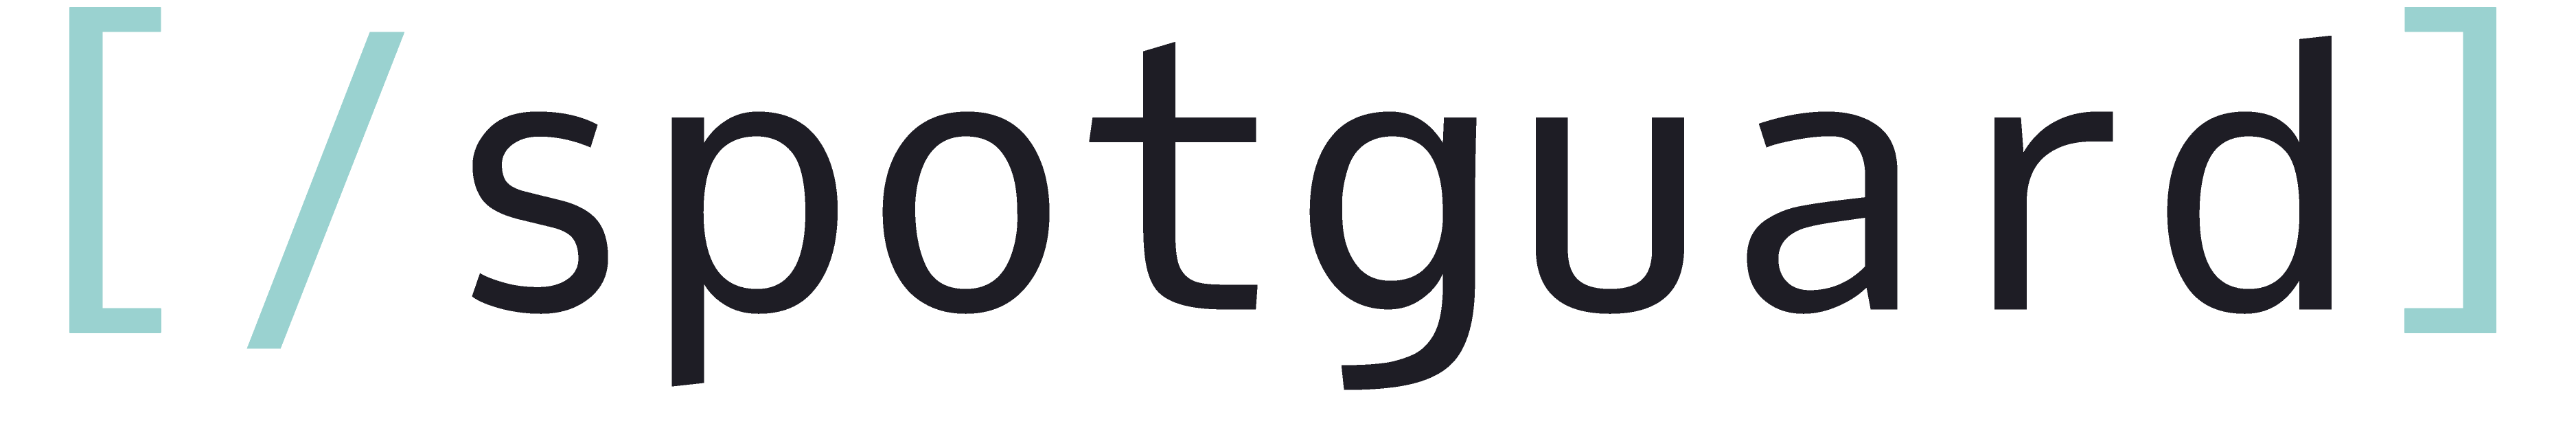 Spotguard logotipas